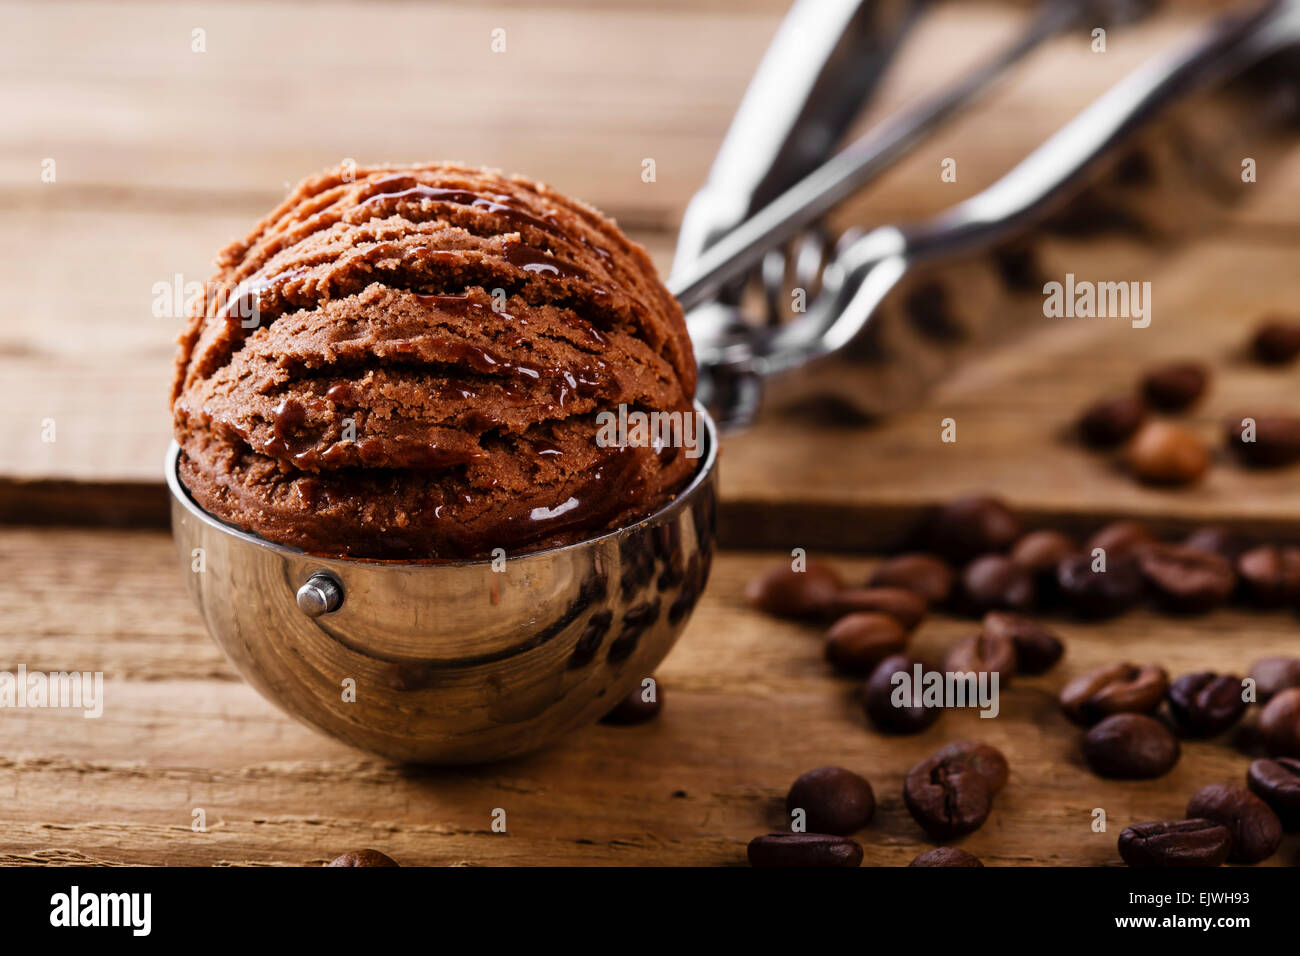 Chocolate coffee ice cream ball scoop spoon - Stock Image